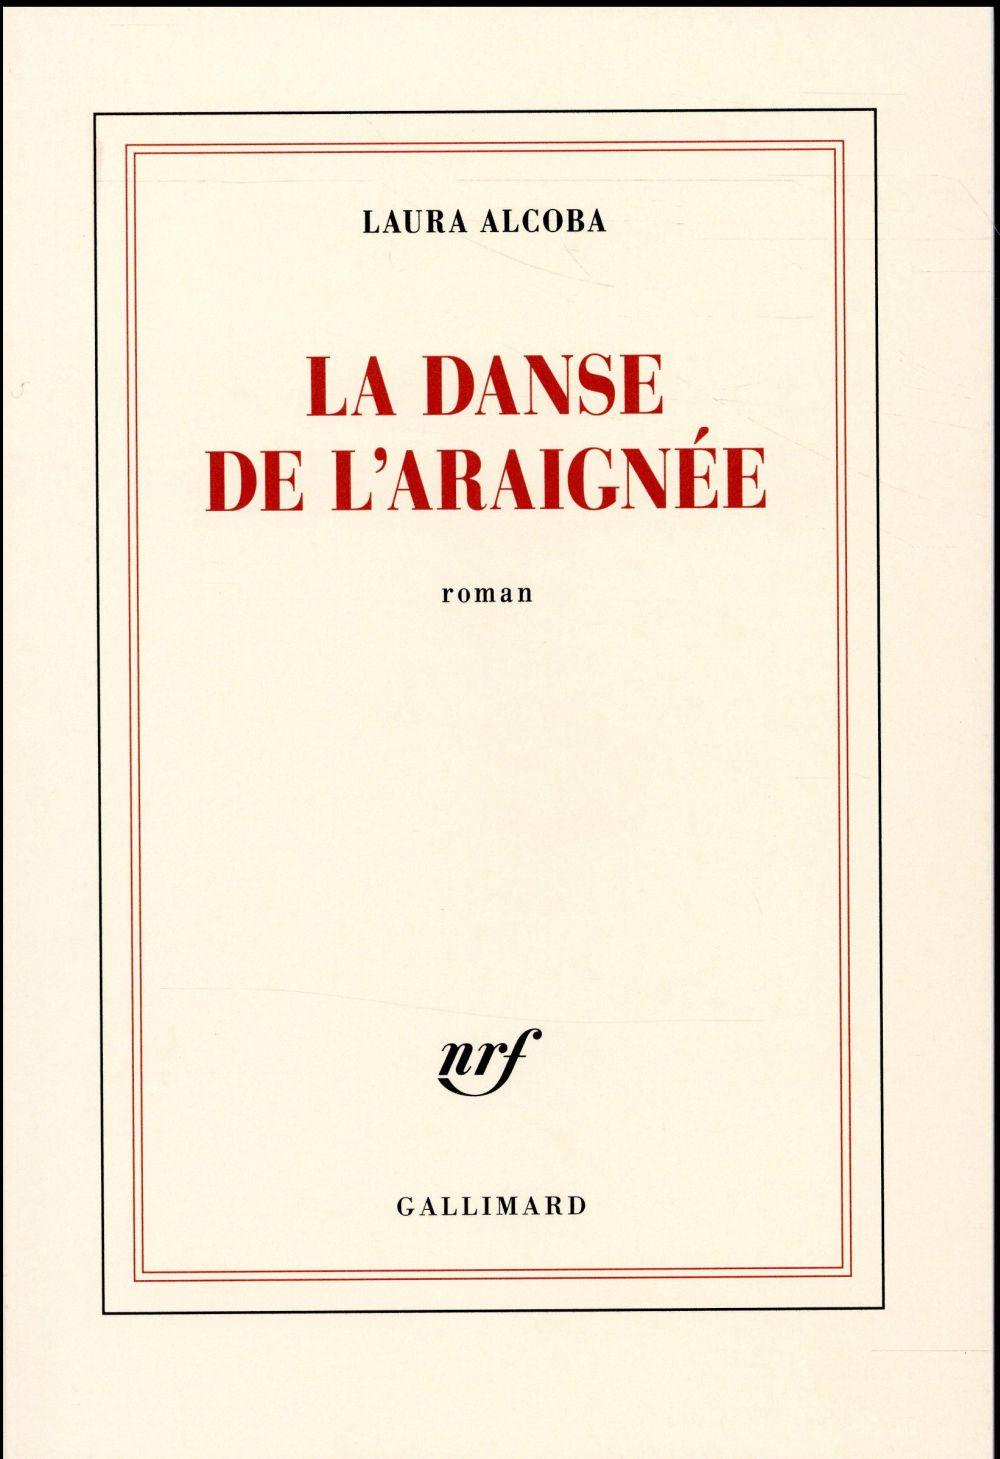 LA DANSE DE L'ARAIGNEE